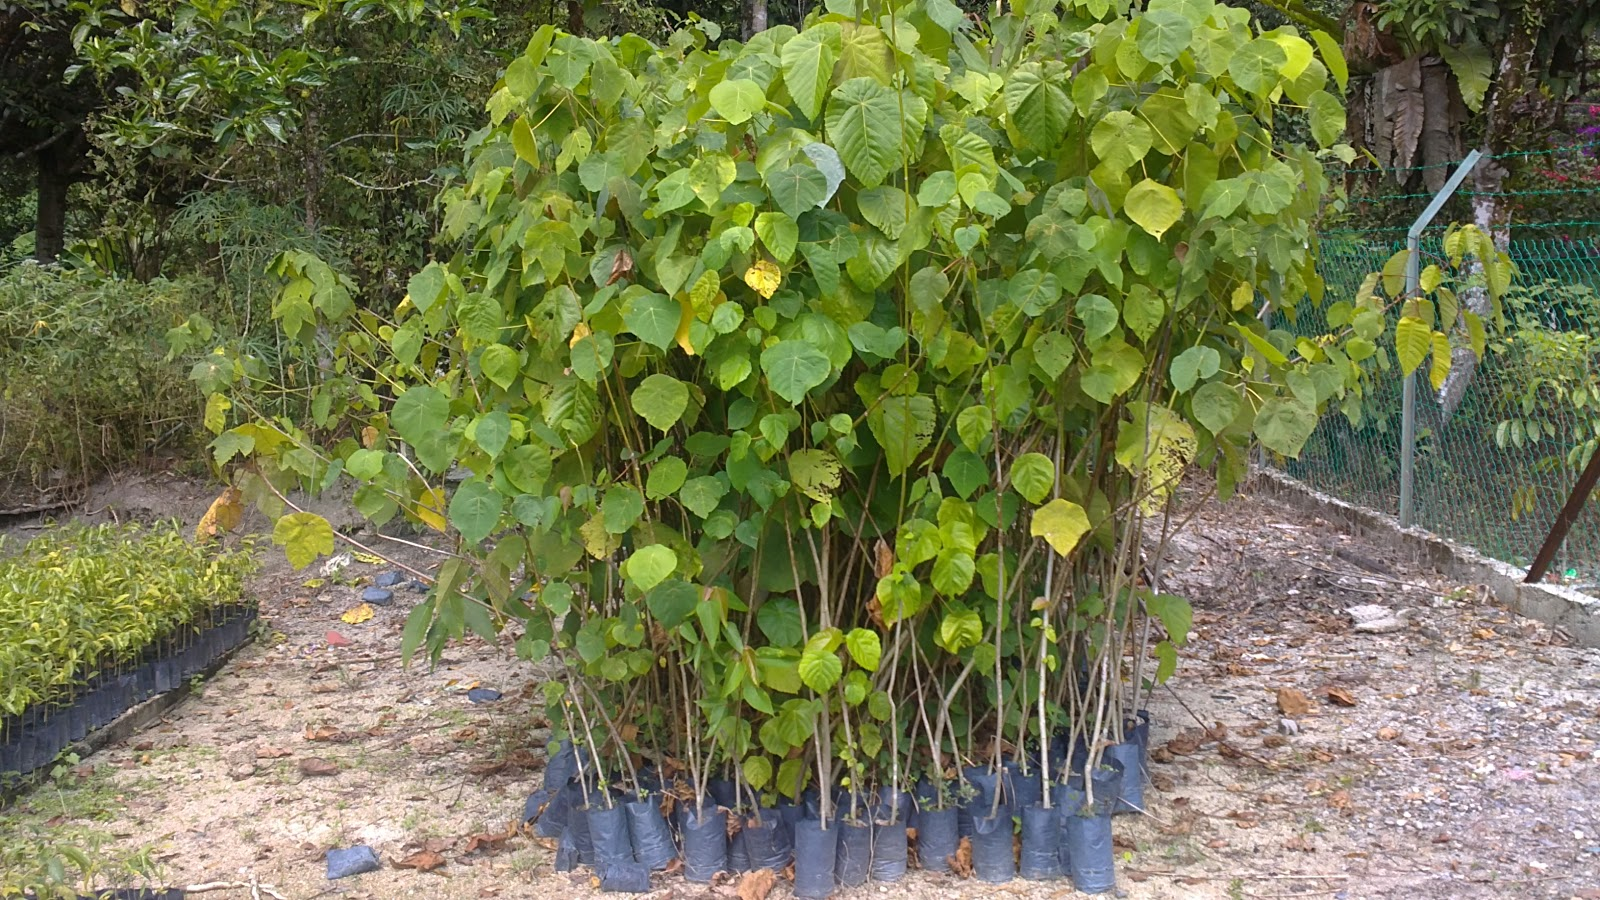 macaranga pruinosa The methanolic fresh leaf extracts of macaranga gigantea, macaranga pruinosa, macaranga tanarius and macaranga triloba were screened for their antioxidant properties (aop), tyrosinase inhibition and antibacterial activities total phenolic content (tpc), 1,1-diphenyl-2-picrylhydrazyl (dpph) free radical.